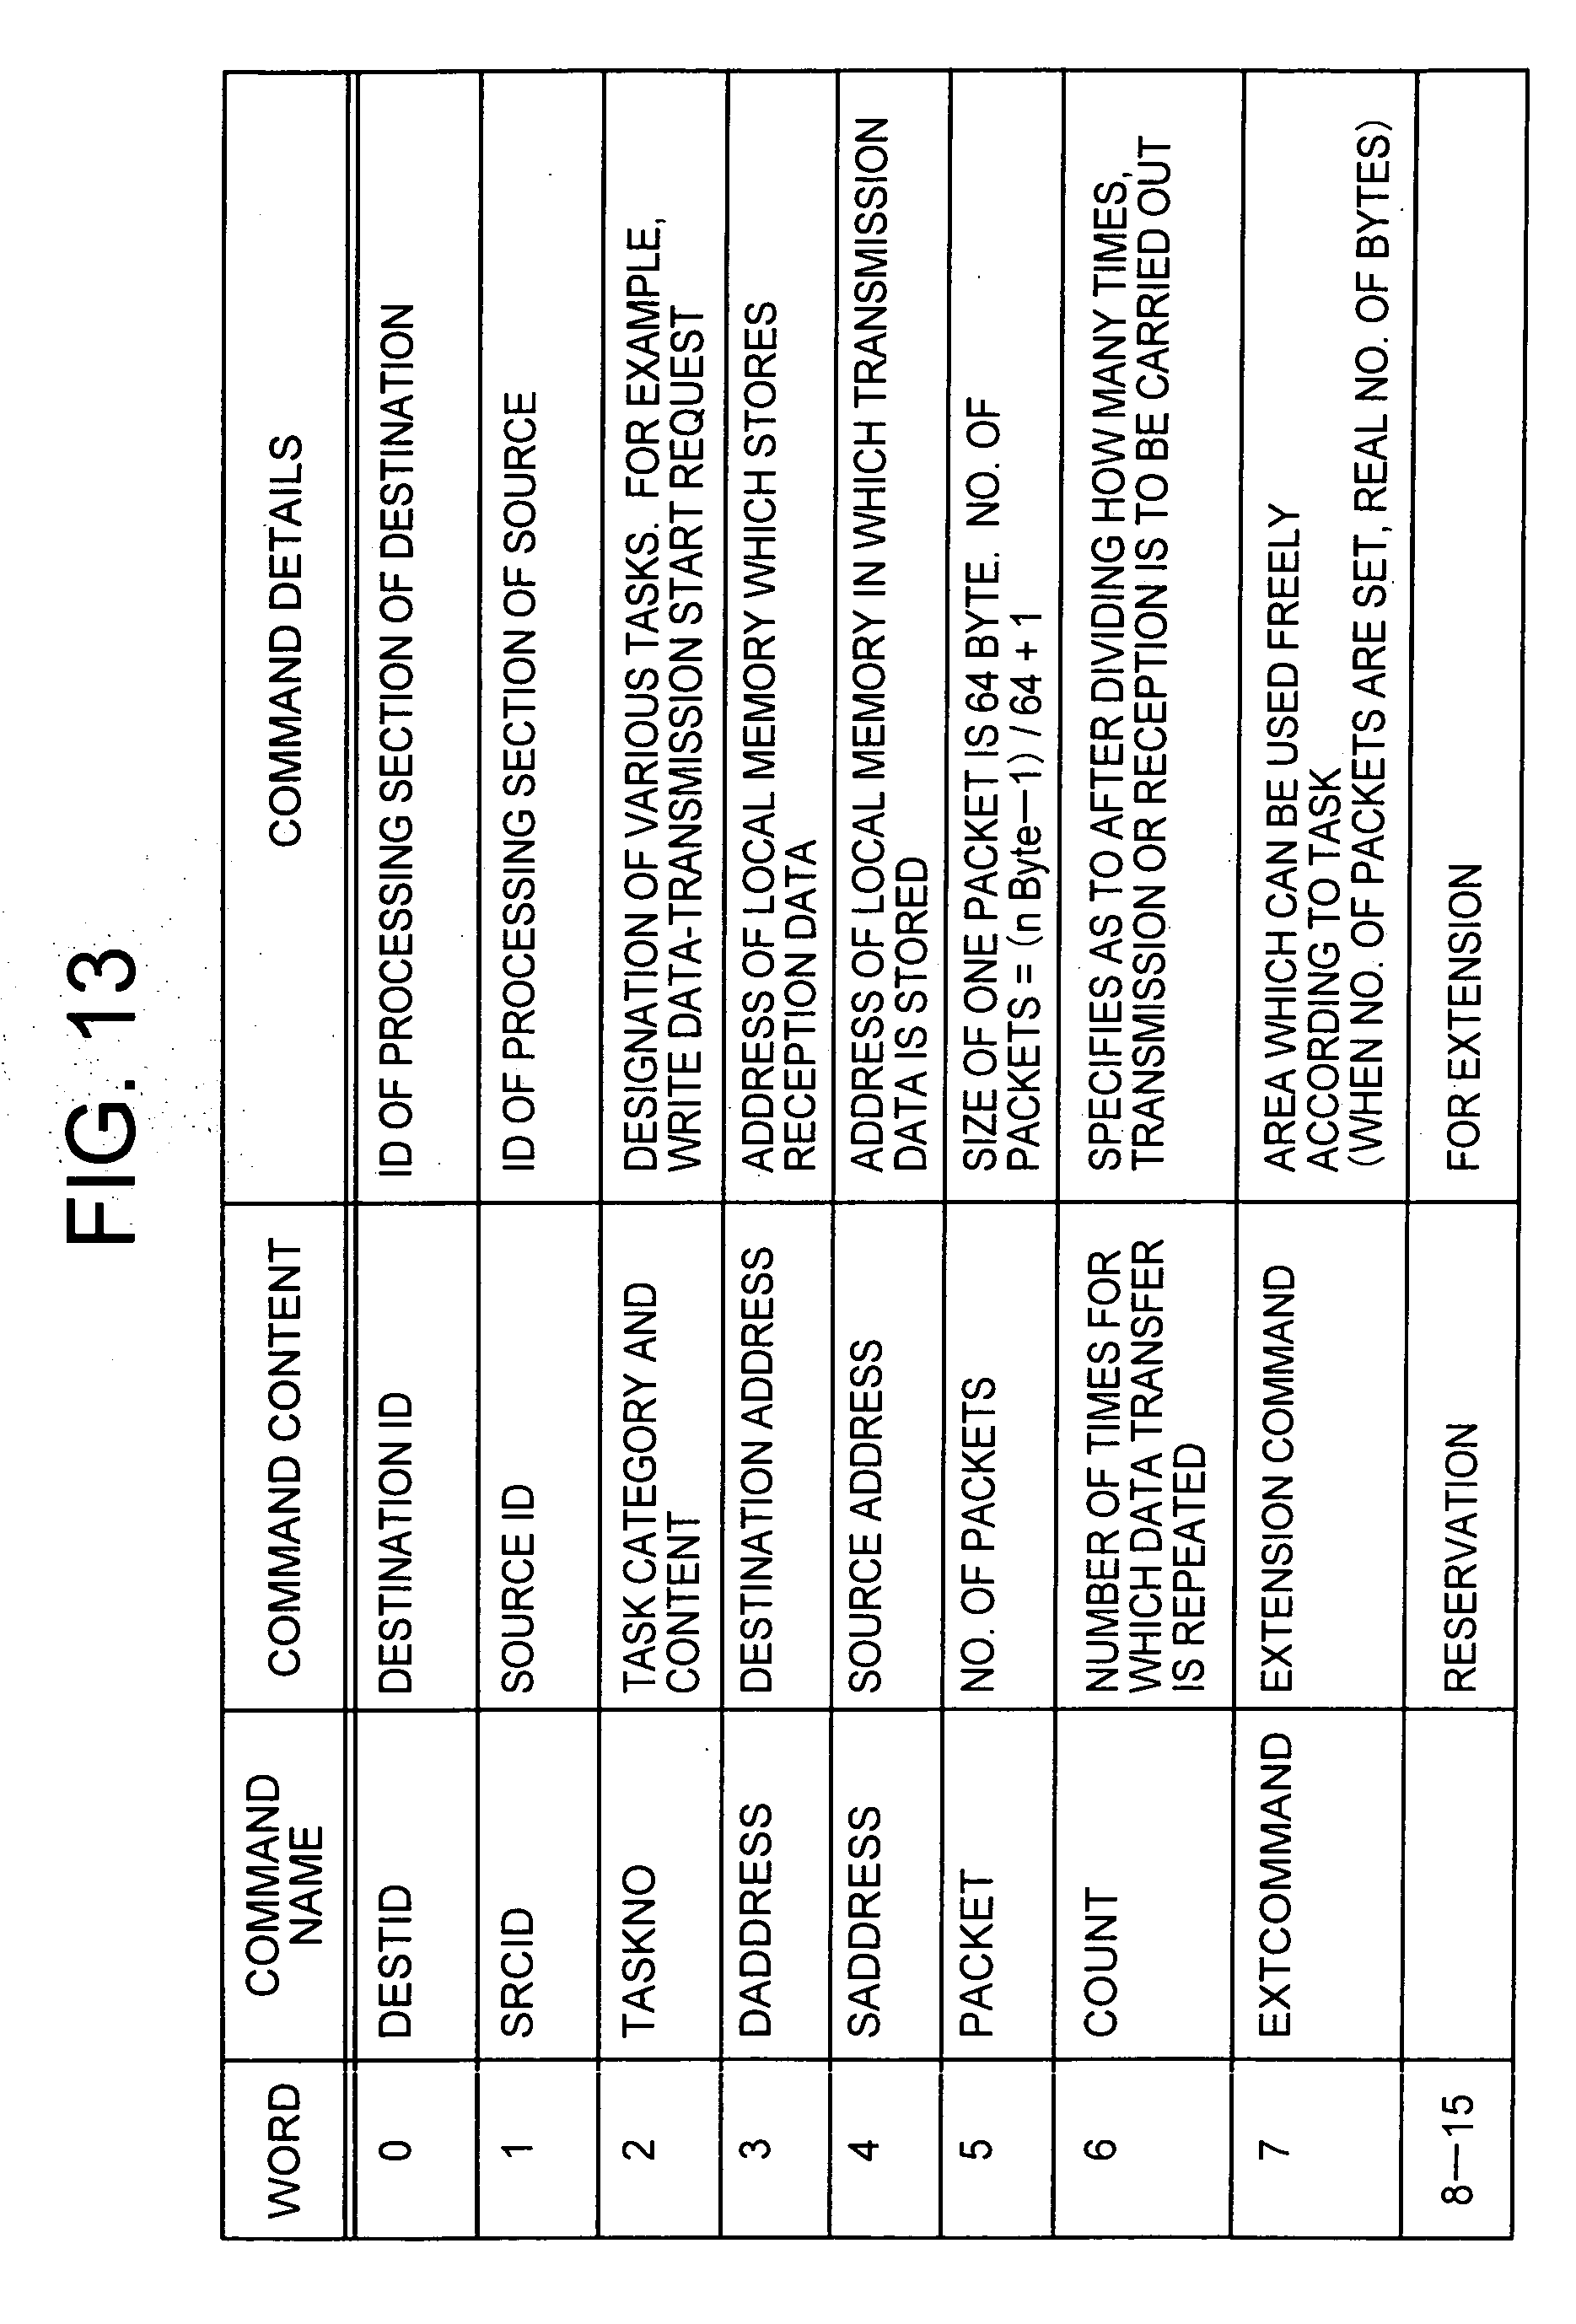 براءة الاختراع US20100100705 - Distributed Processing System